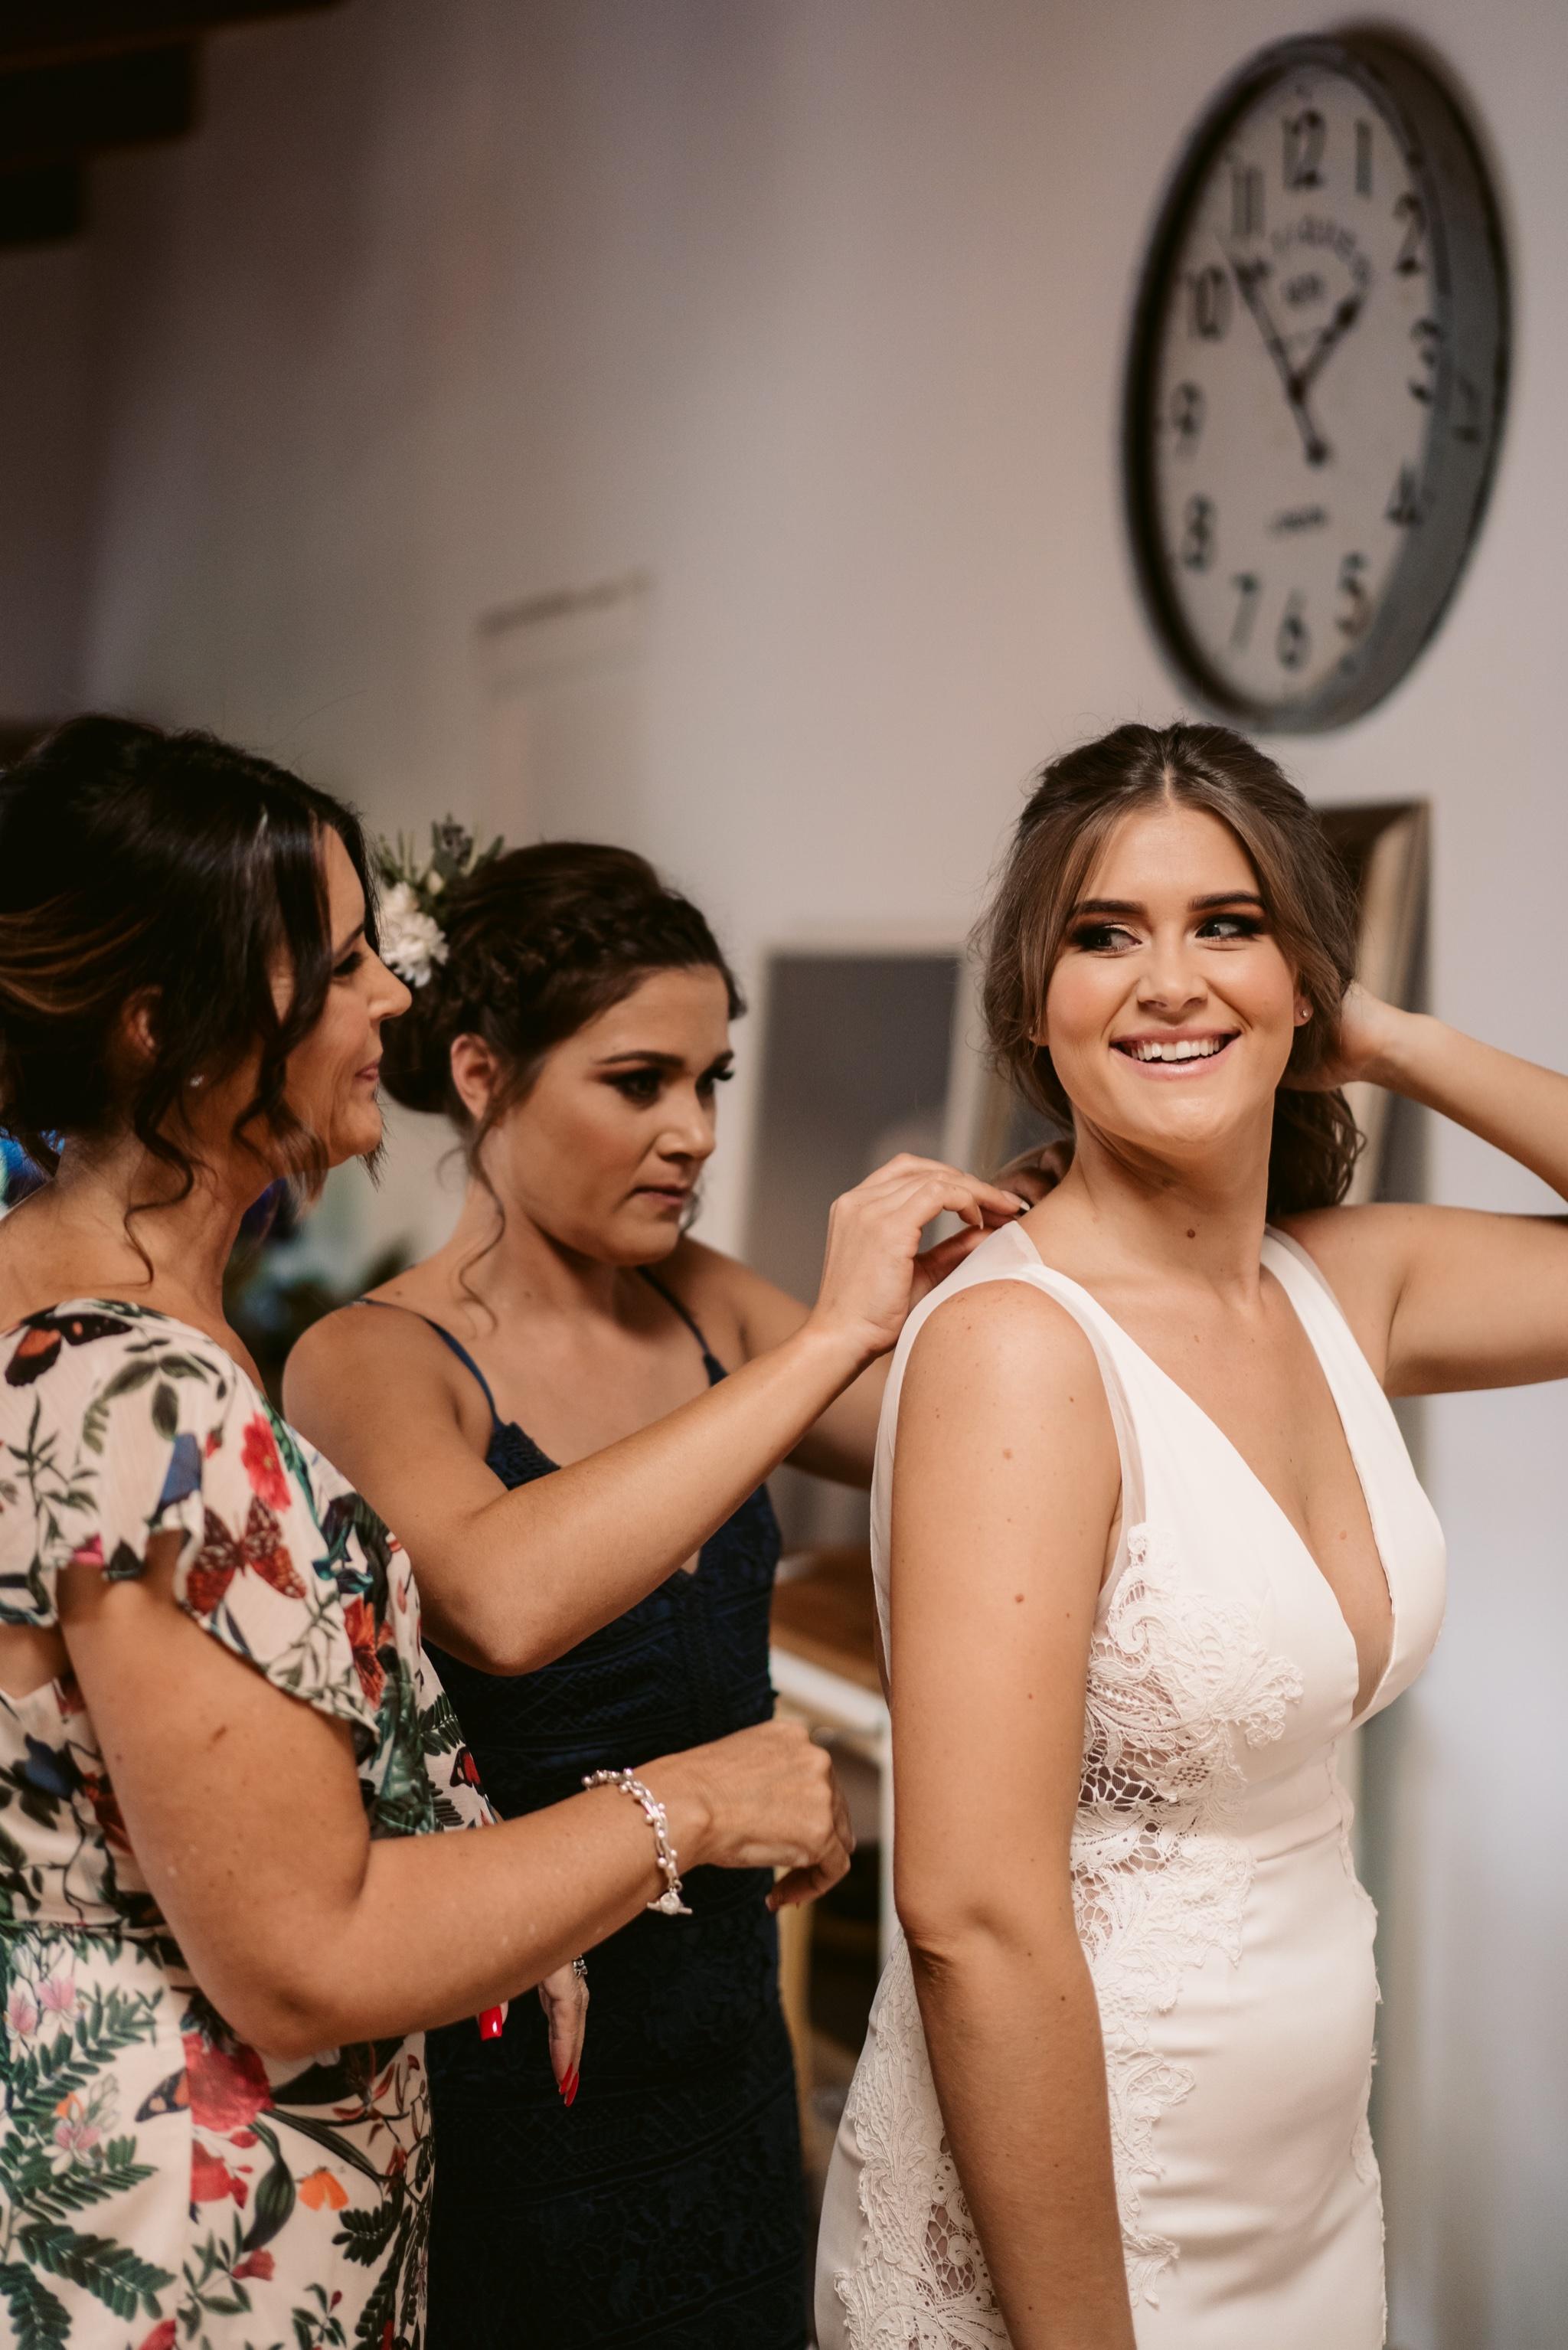 Mornington Peninsula Wedding Photography16.jpg